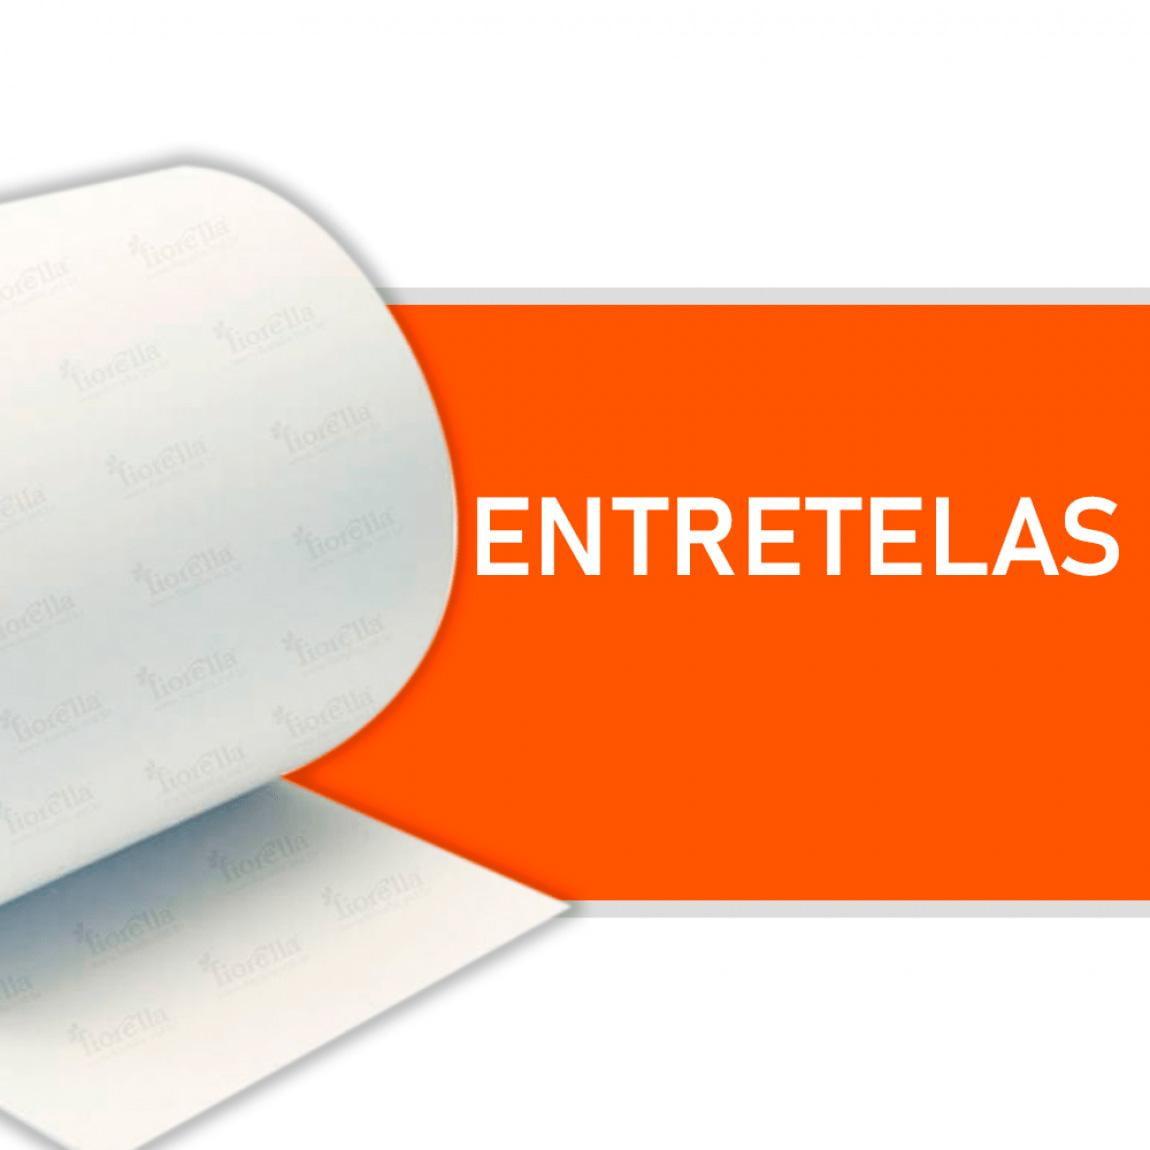 ENTRETELA